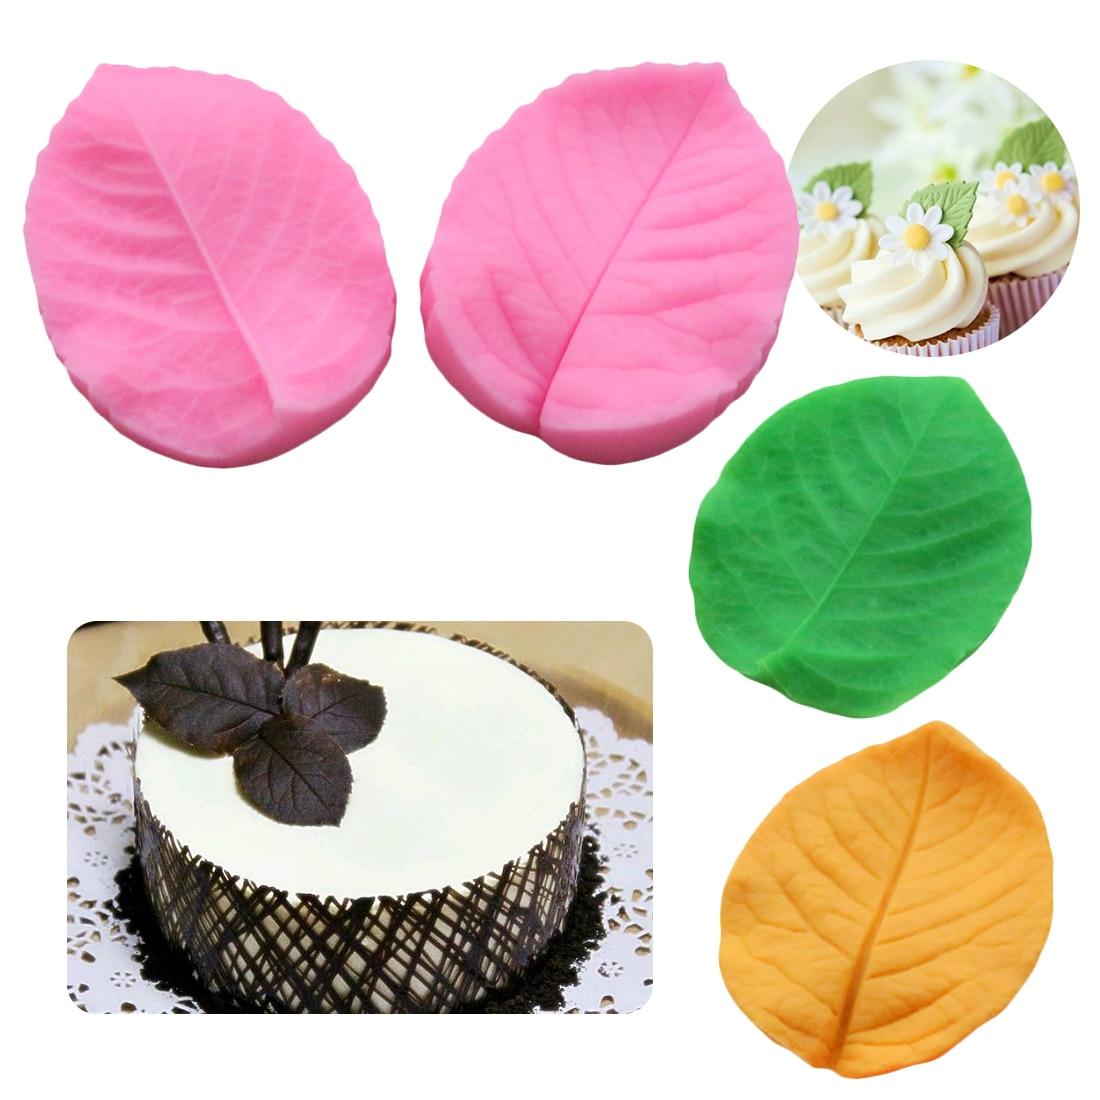 New 2pcs Rose Leaf Press Silicone Fondant Cake Mould Chocolate Candy Decor Molds